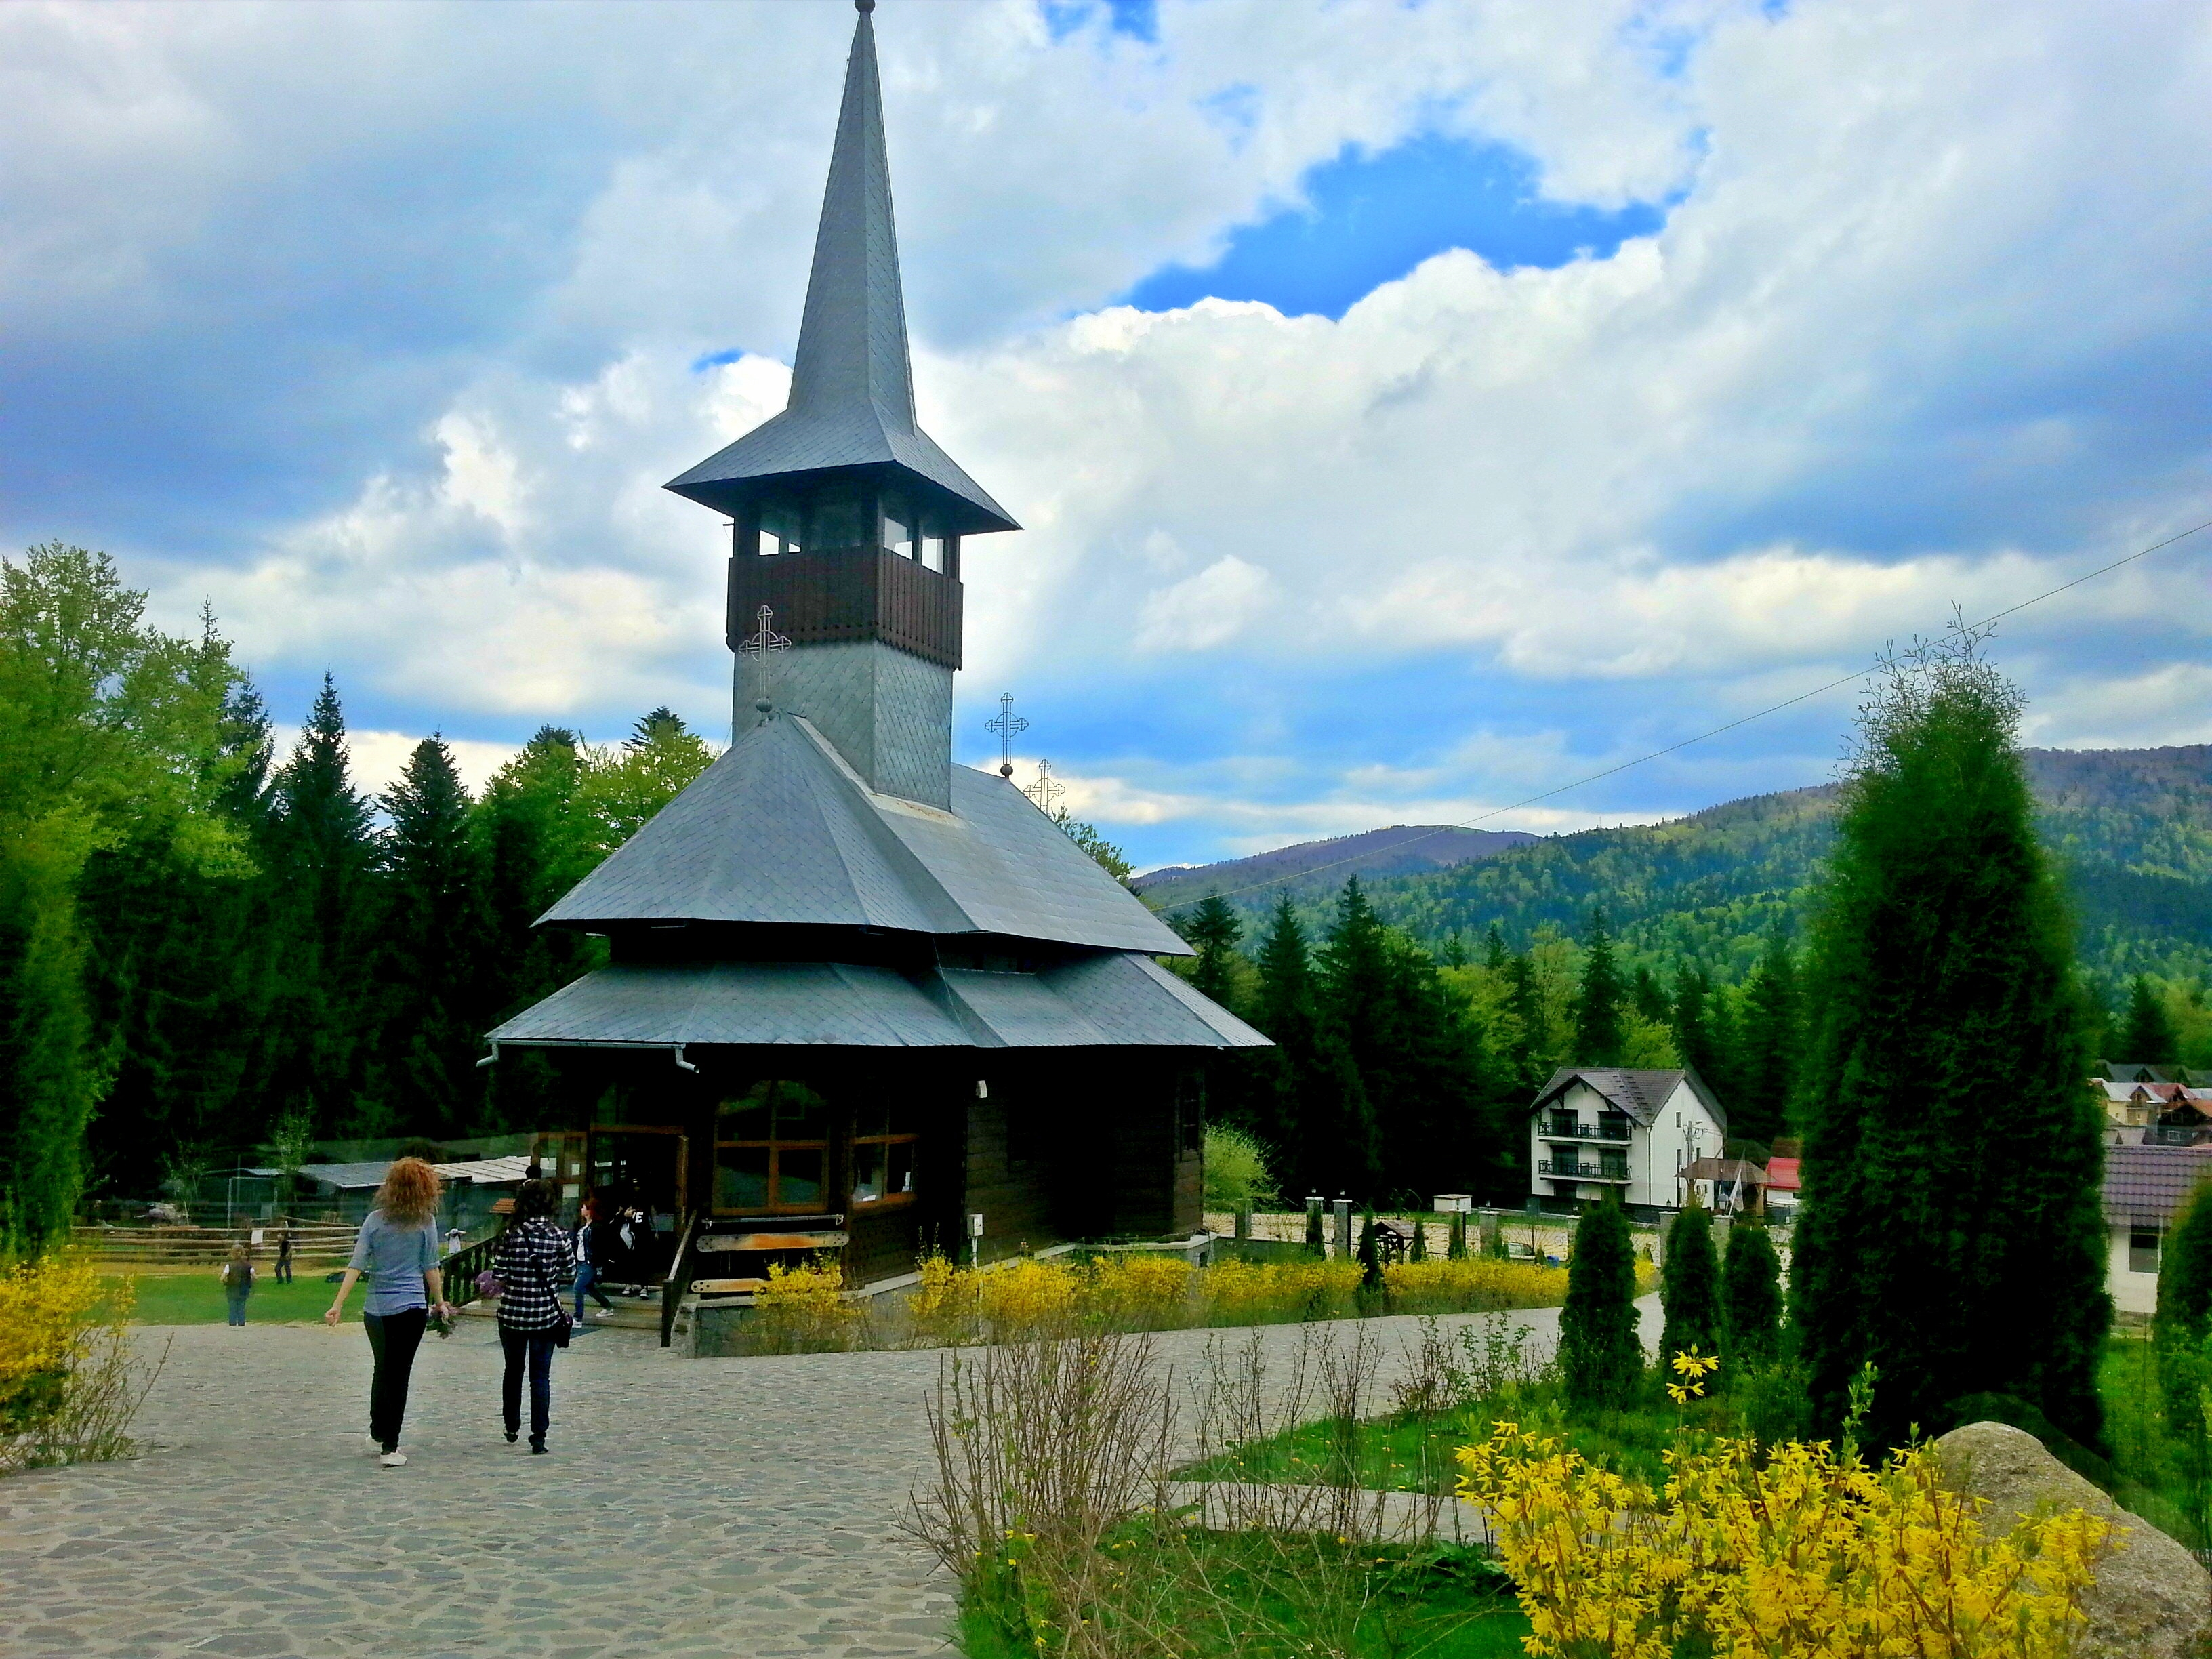 Manastirea_Caraiman_-_panoramio